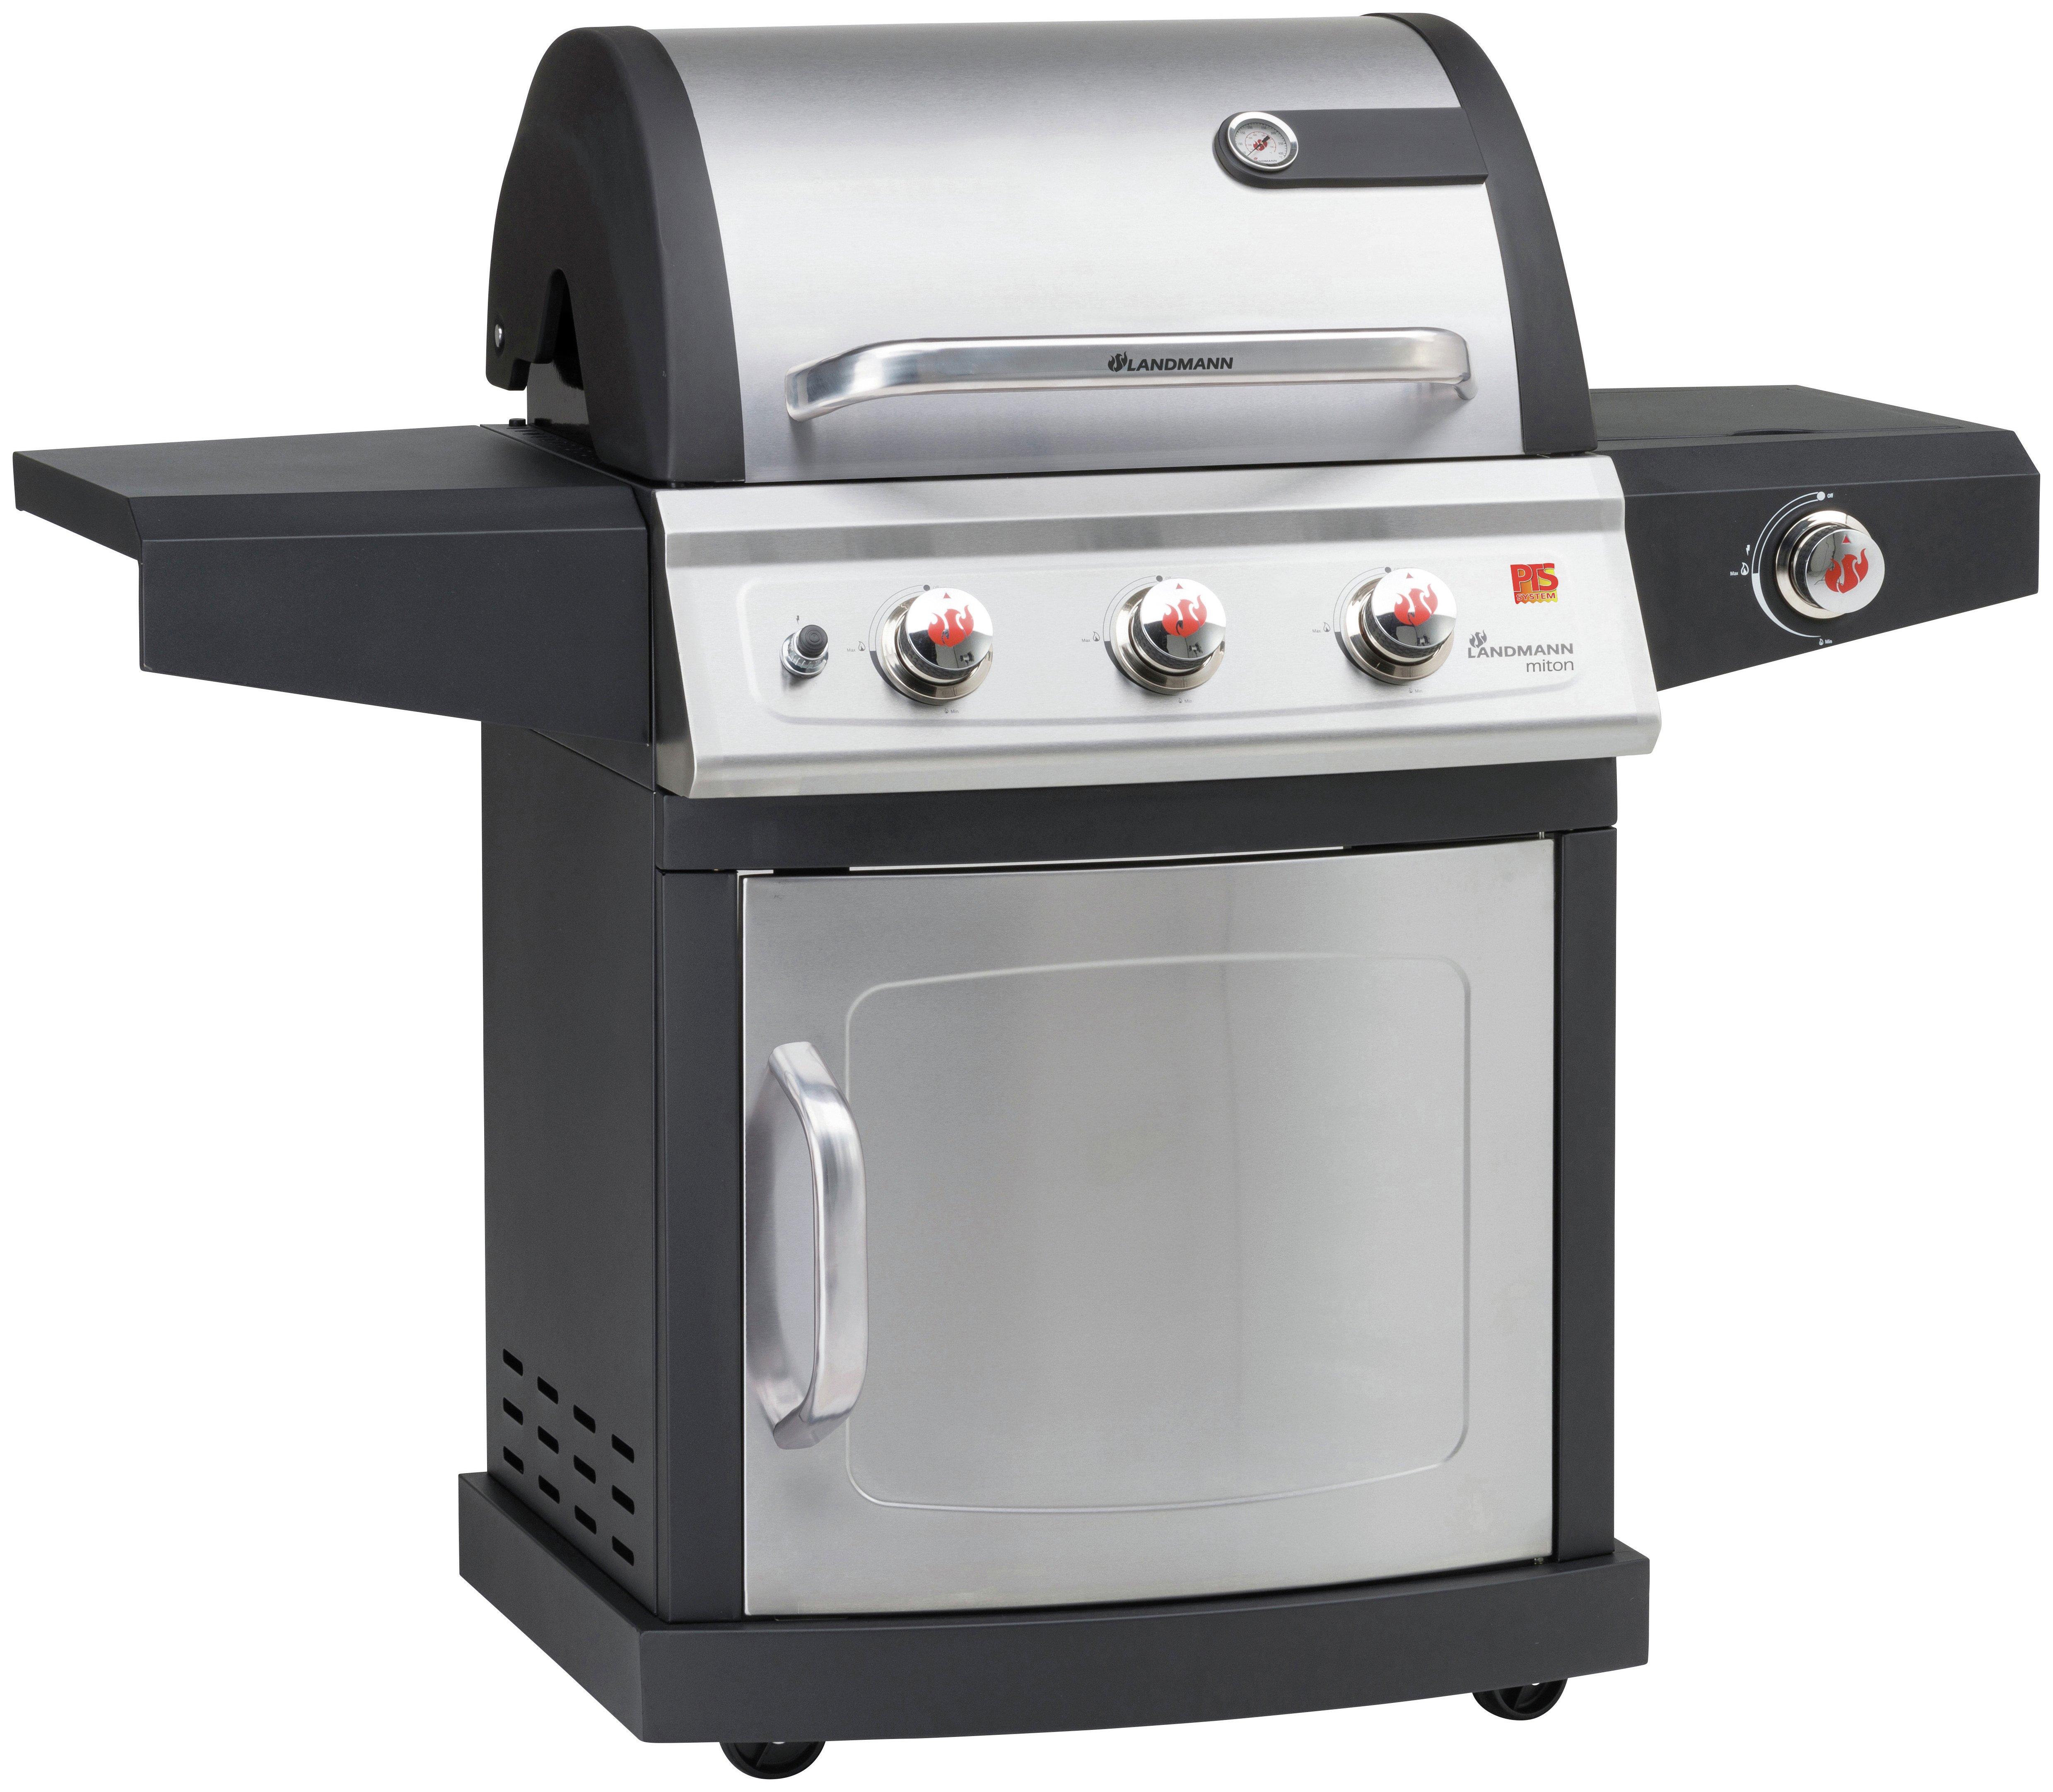 Landmann Miton 3 Burner Gas BBQ with Side Burner. lowest price